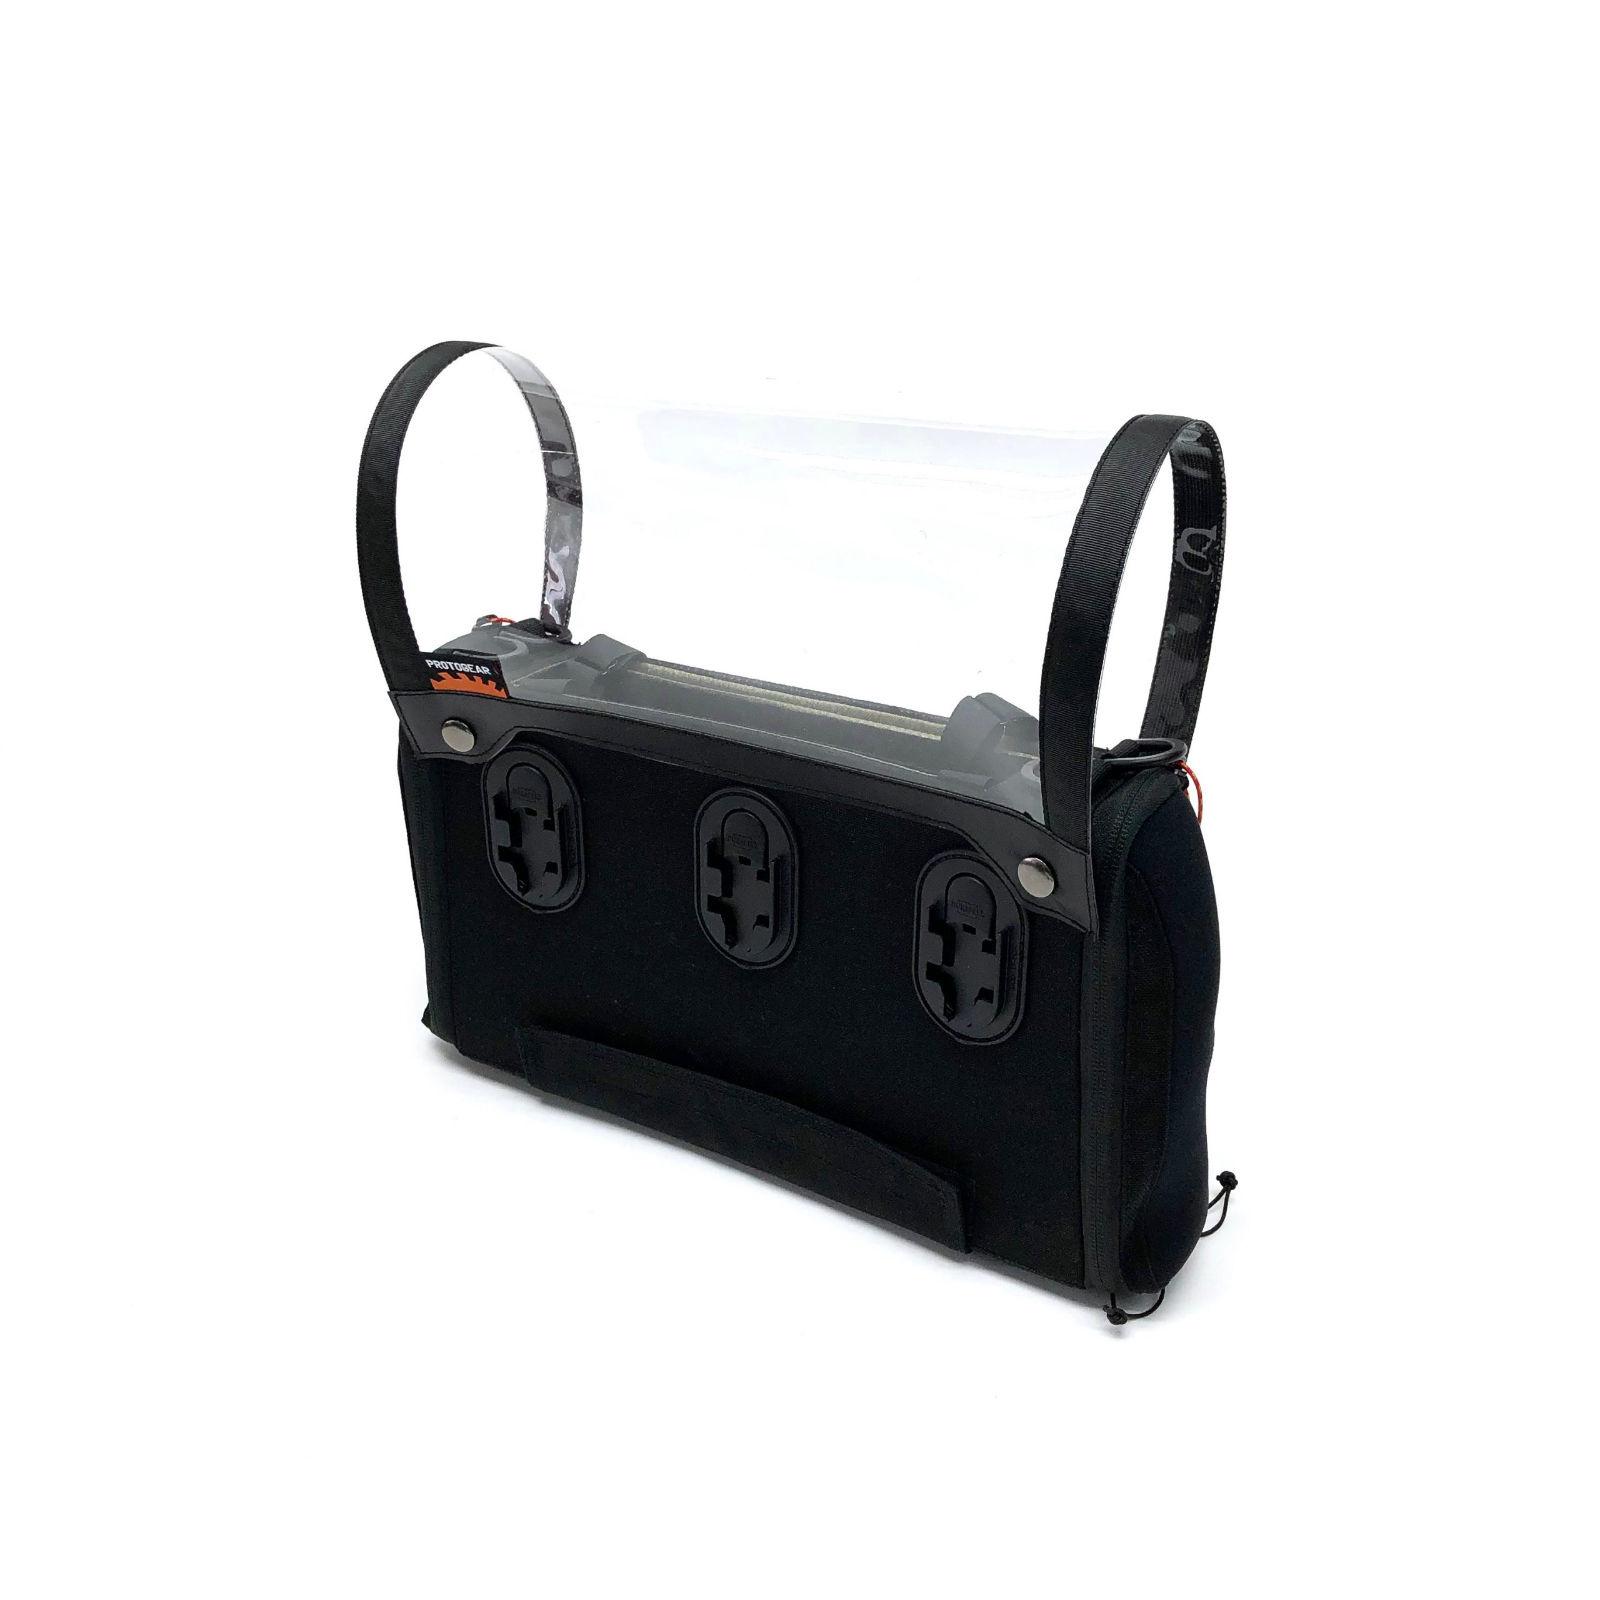 Protogear Protogear – Rain Cover für Protogear Sound Bag